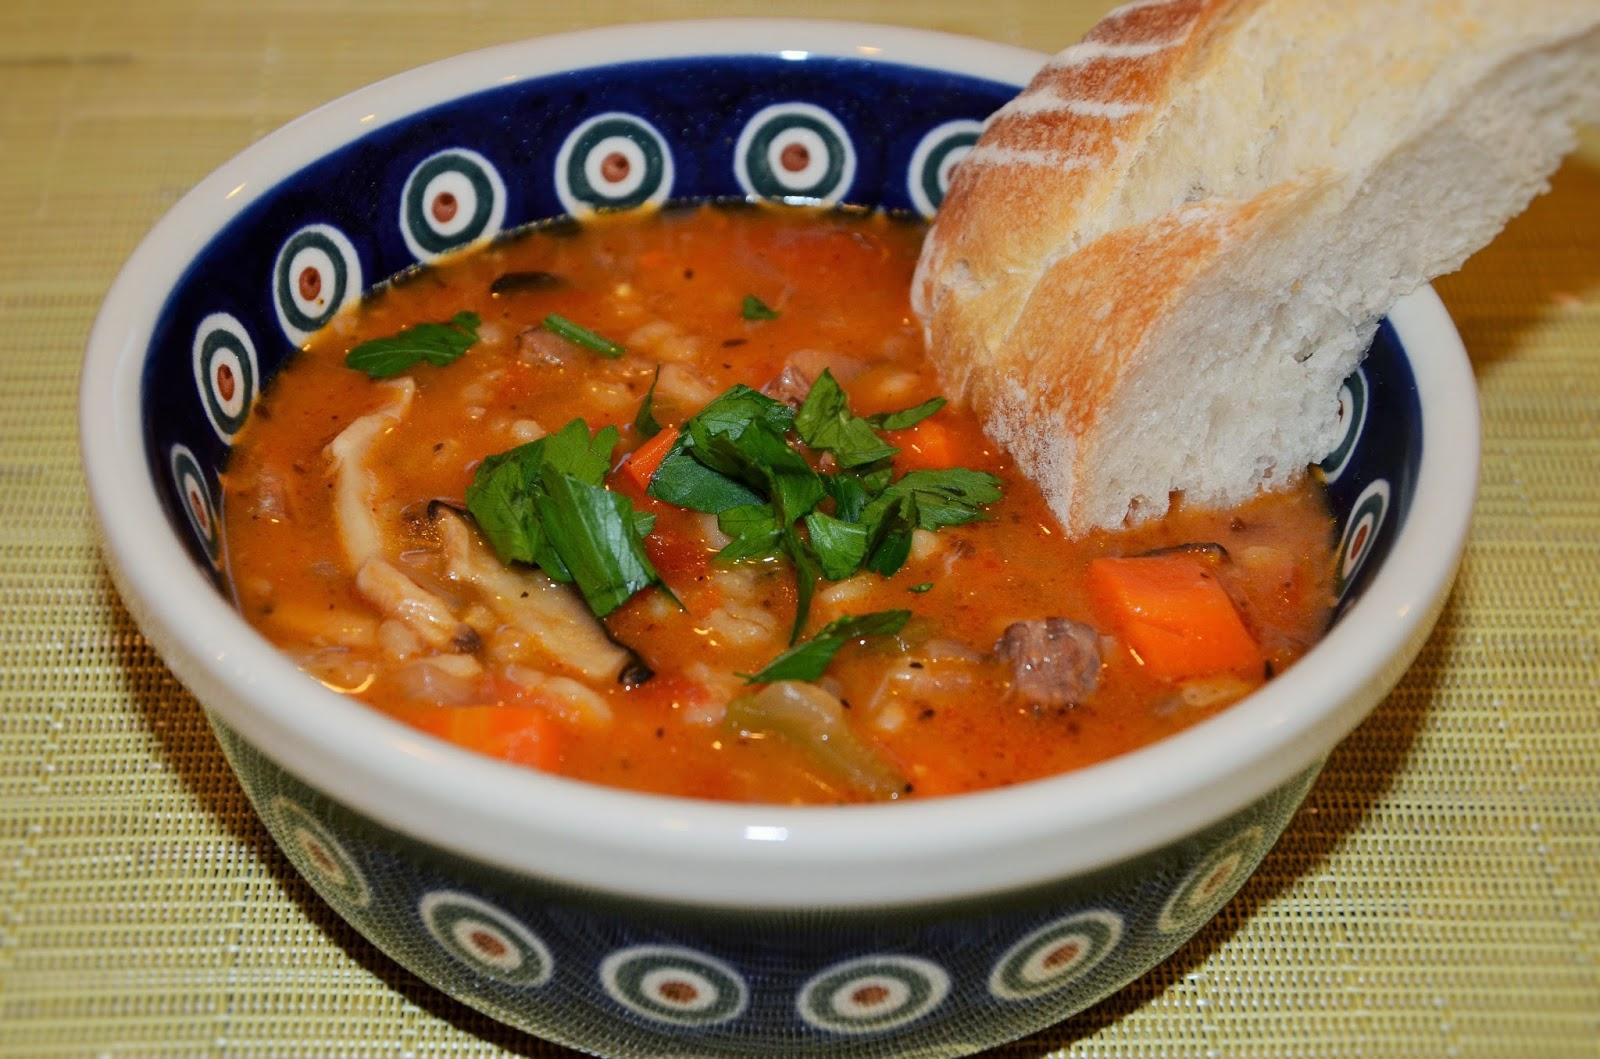 Food Network Mushroom Barley Soup